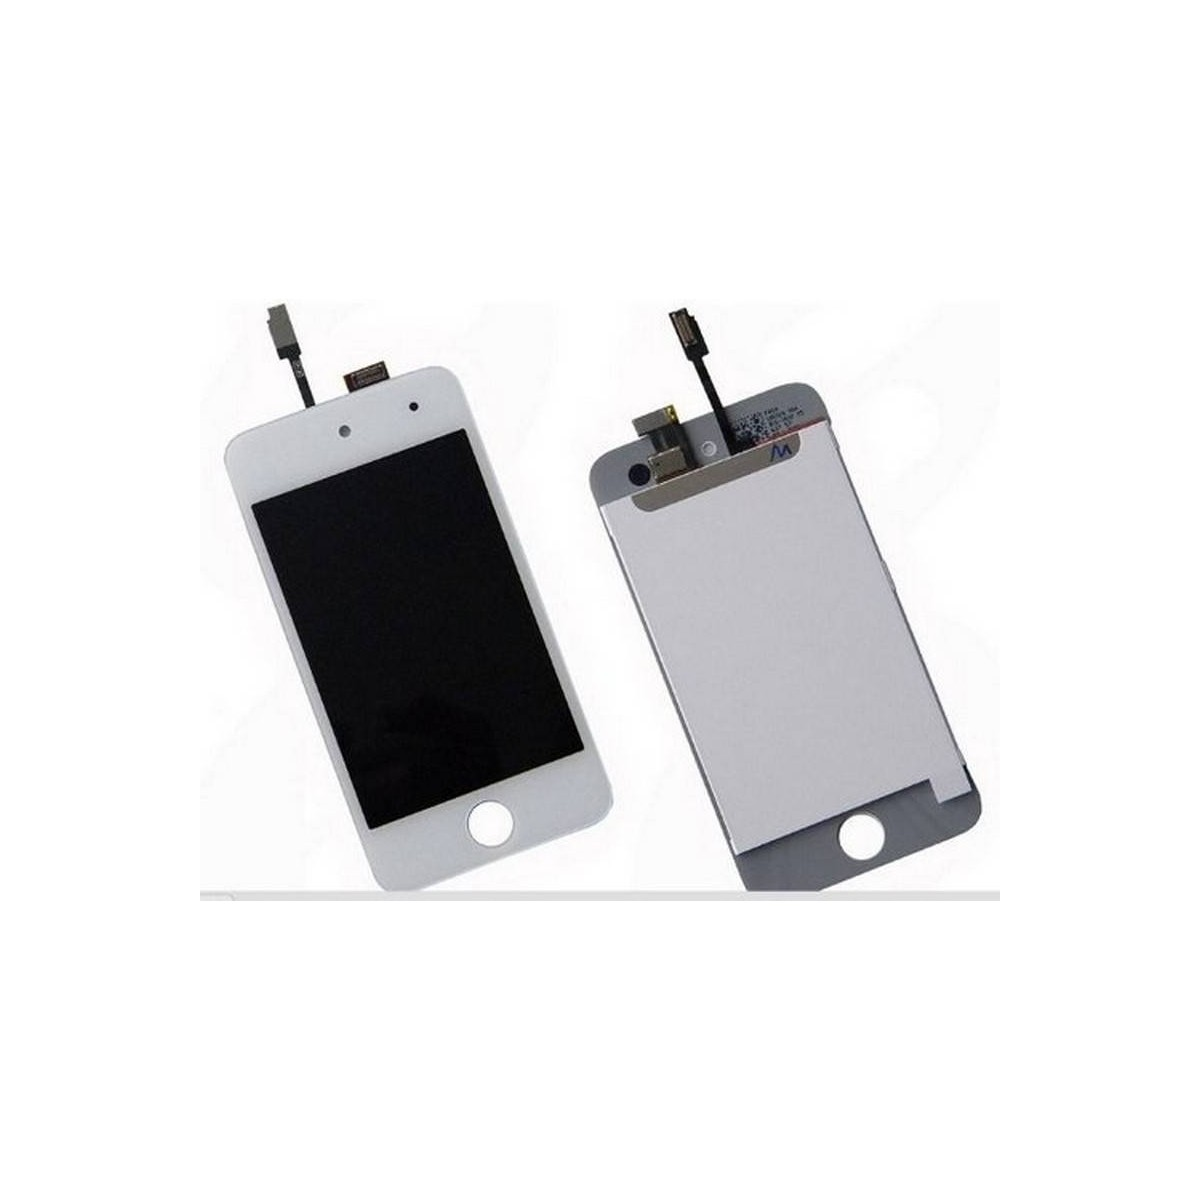 Ecrã (Display) completa para iPod Touch 4th generación em branco